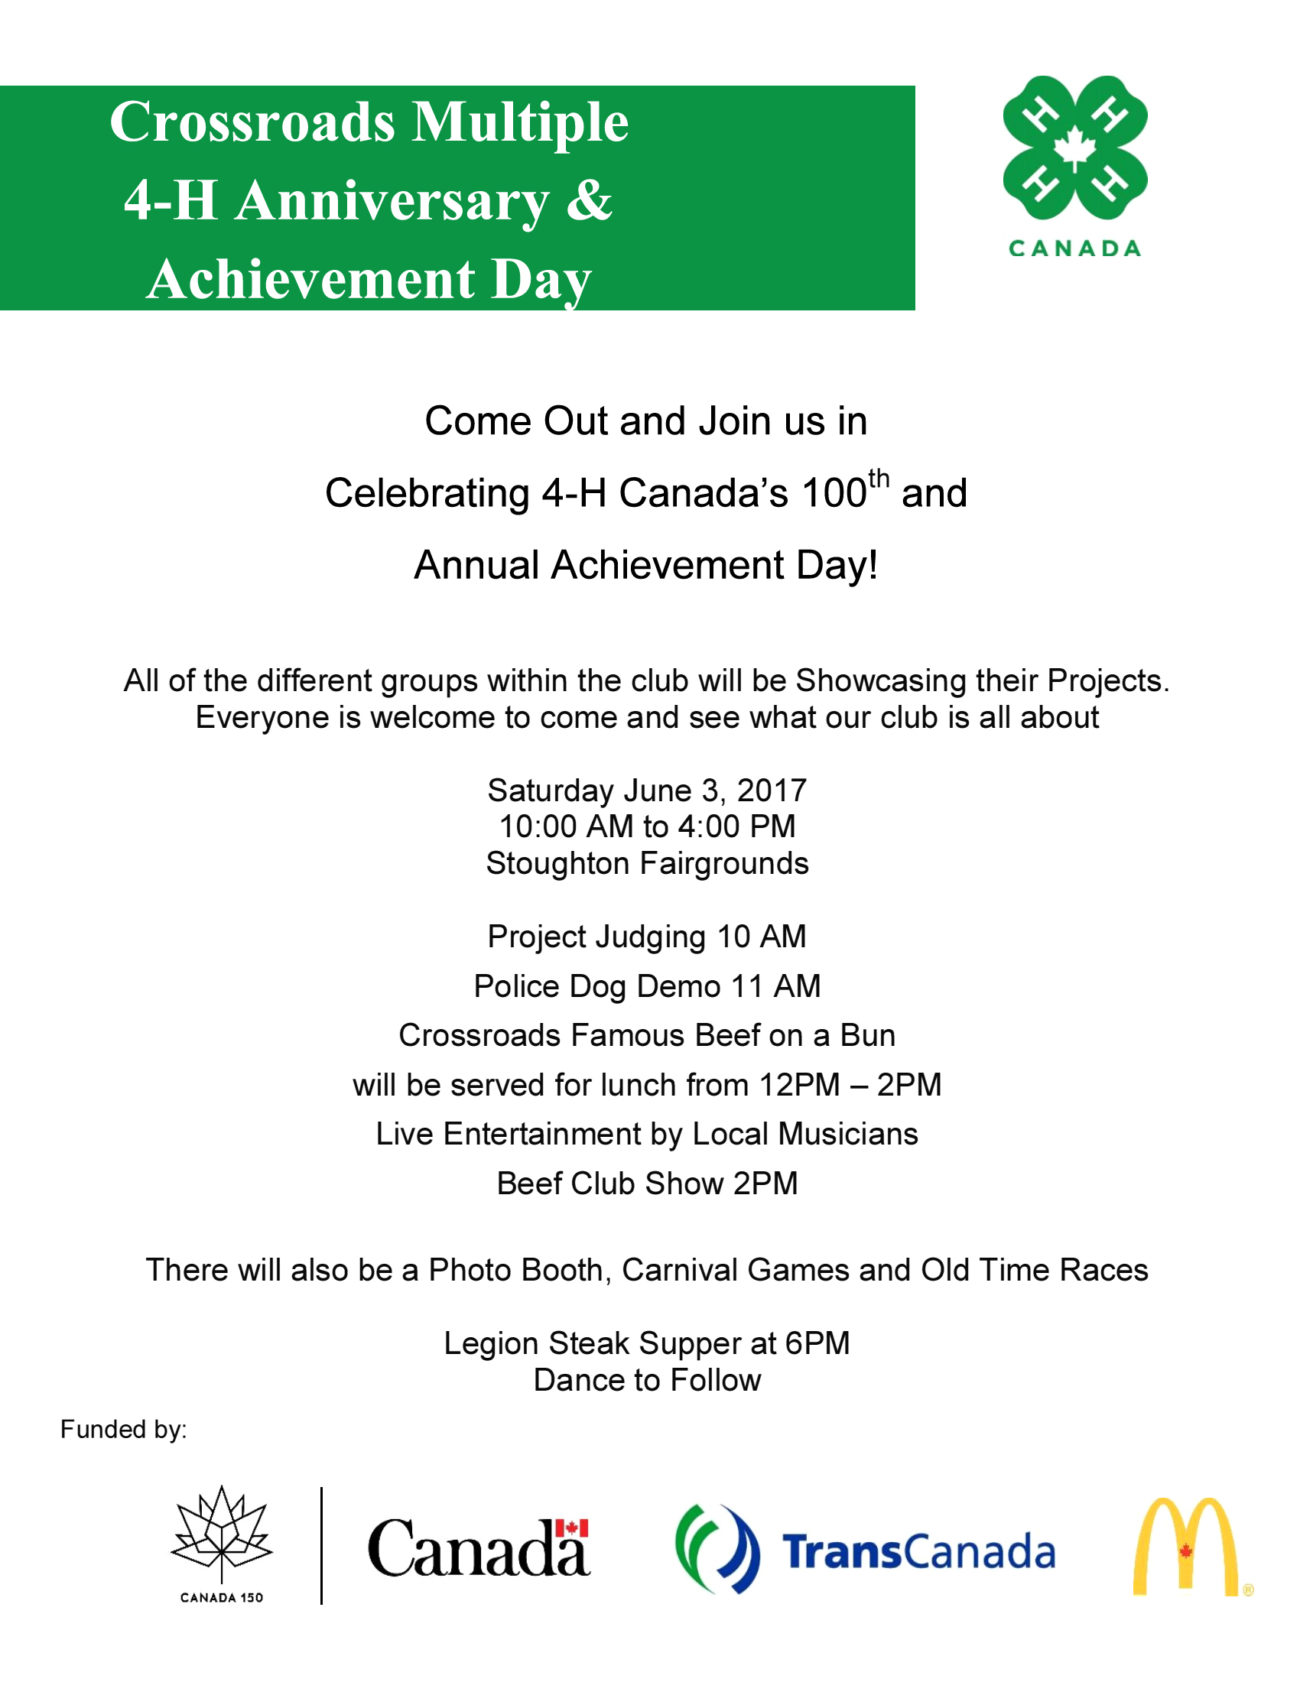 Crossroads Multiple 4-H Anniversary & Achievement Day   Town